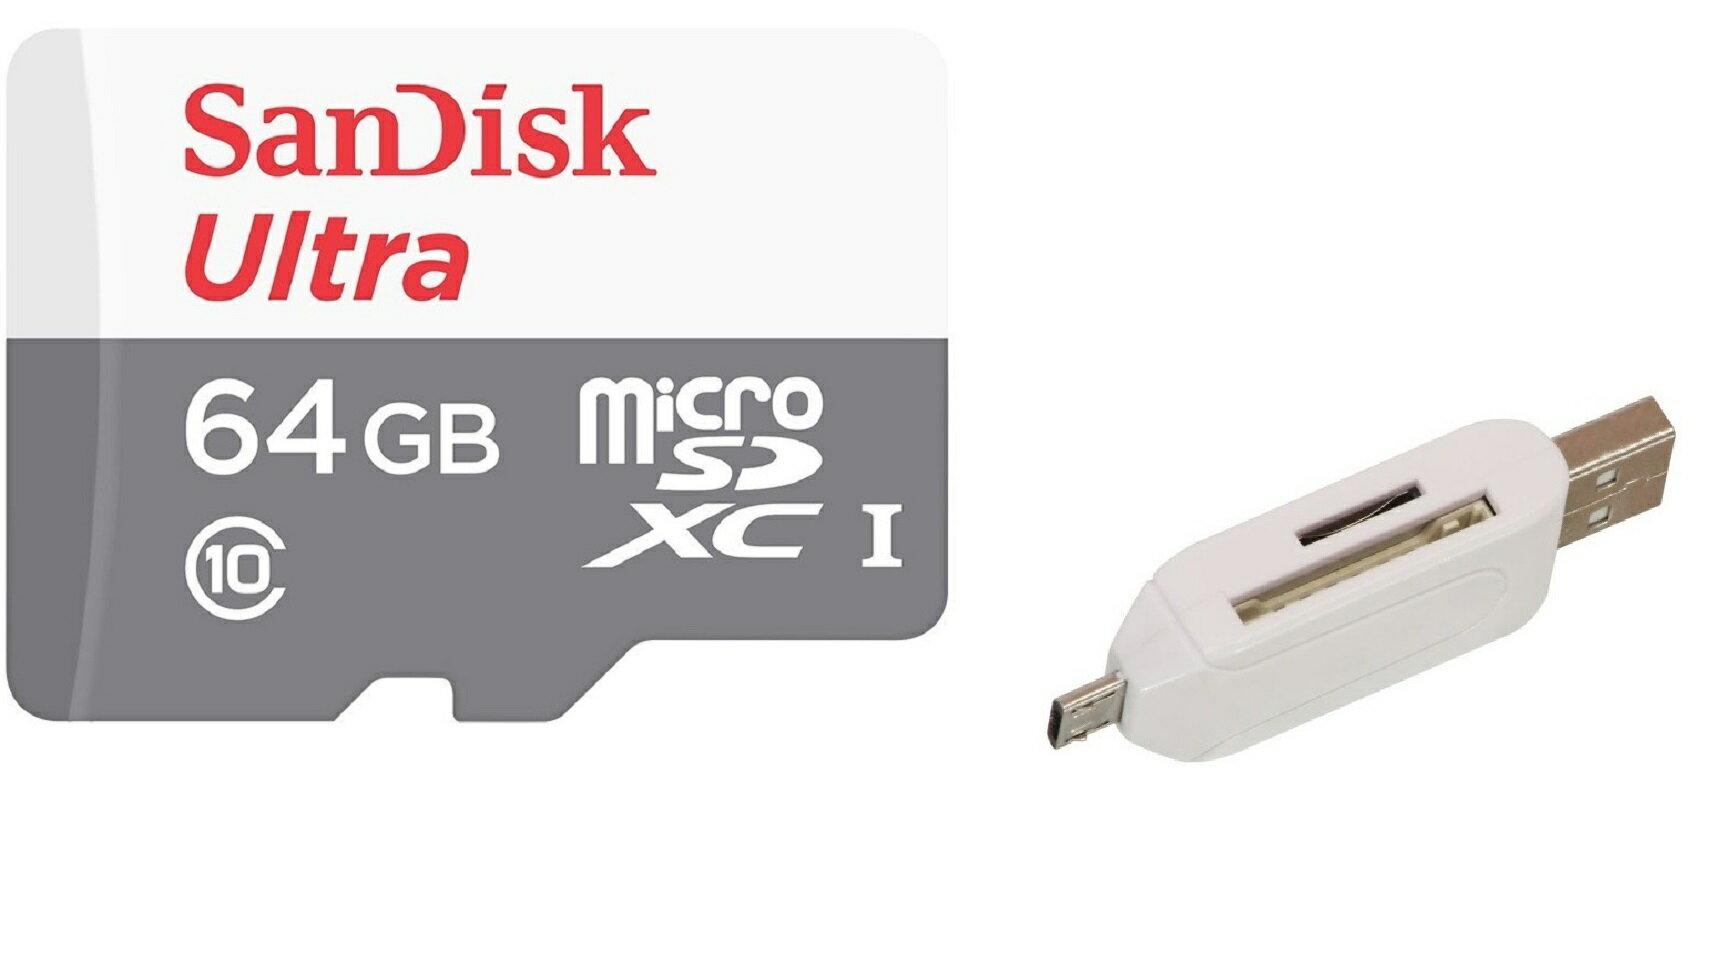 SanDisk Ultra 64GB 80MB/s microSDXC 64G microSD micro SD SDXC UHS-I C10 Class 10 Flash Memory Card SDSQUNS-064G + OEM USB 2.0 OTG Reader 0